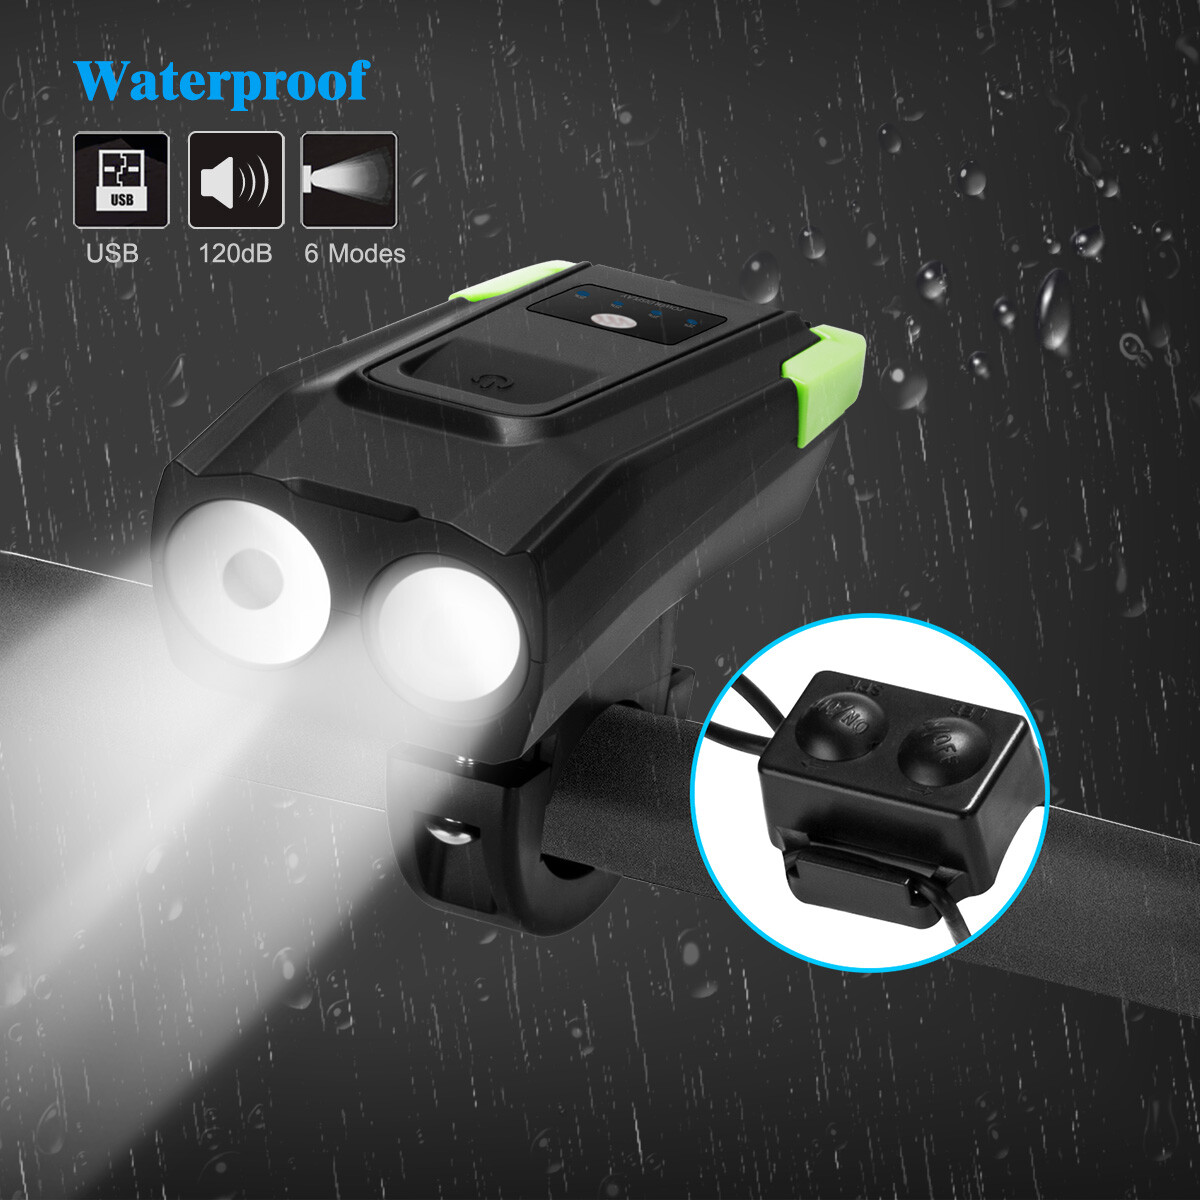 1x T6 LED Cycling Front Light 4-Modes USB charging MTB Bike Front Lamp Headlamp